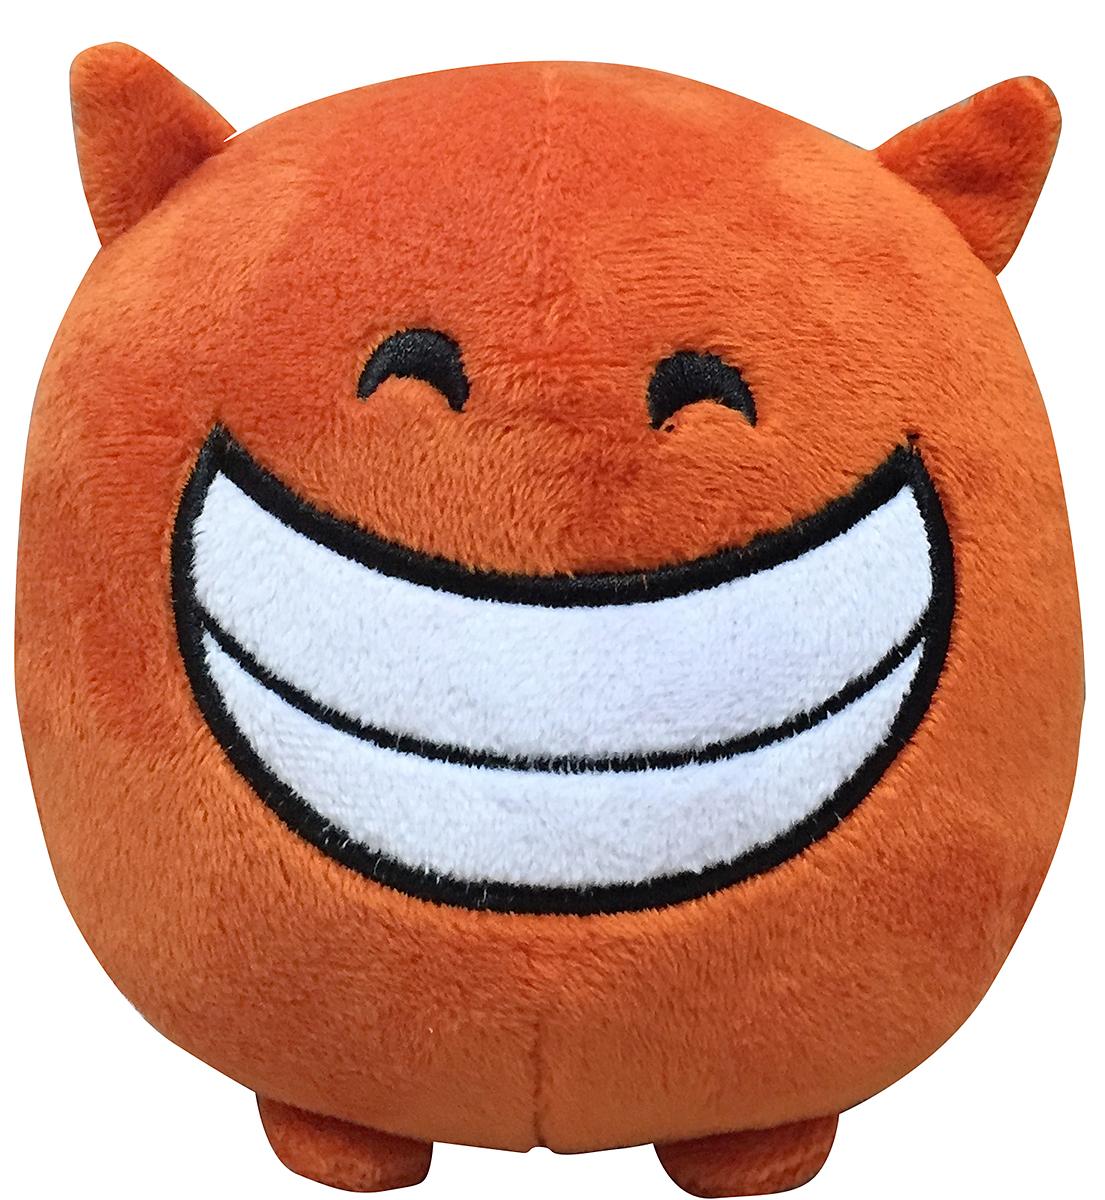 Imoji Мягкая игрушка 12 см 40074 imoji мягкая игрушка 12 см 41059